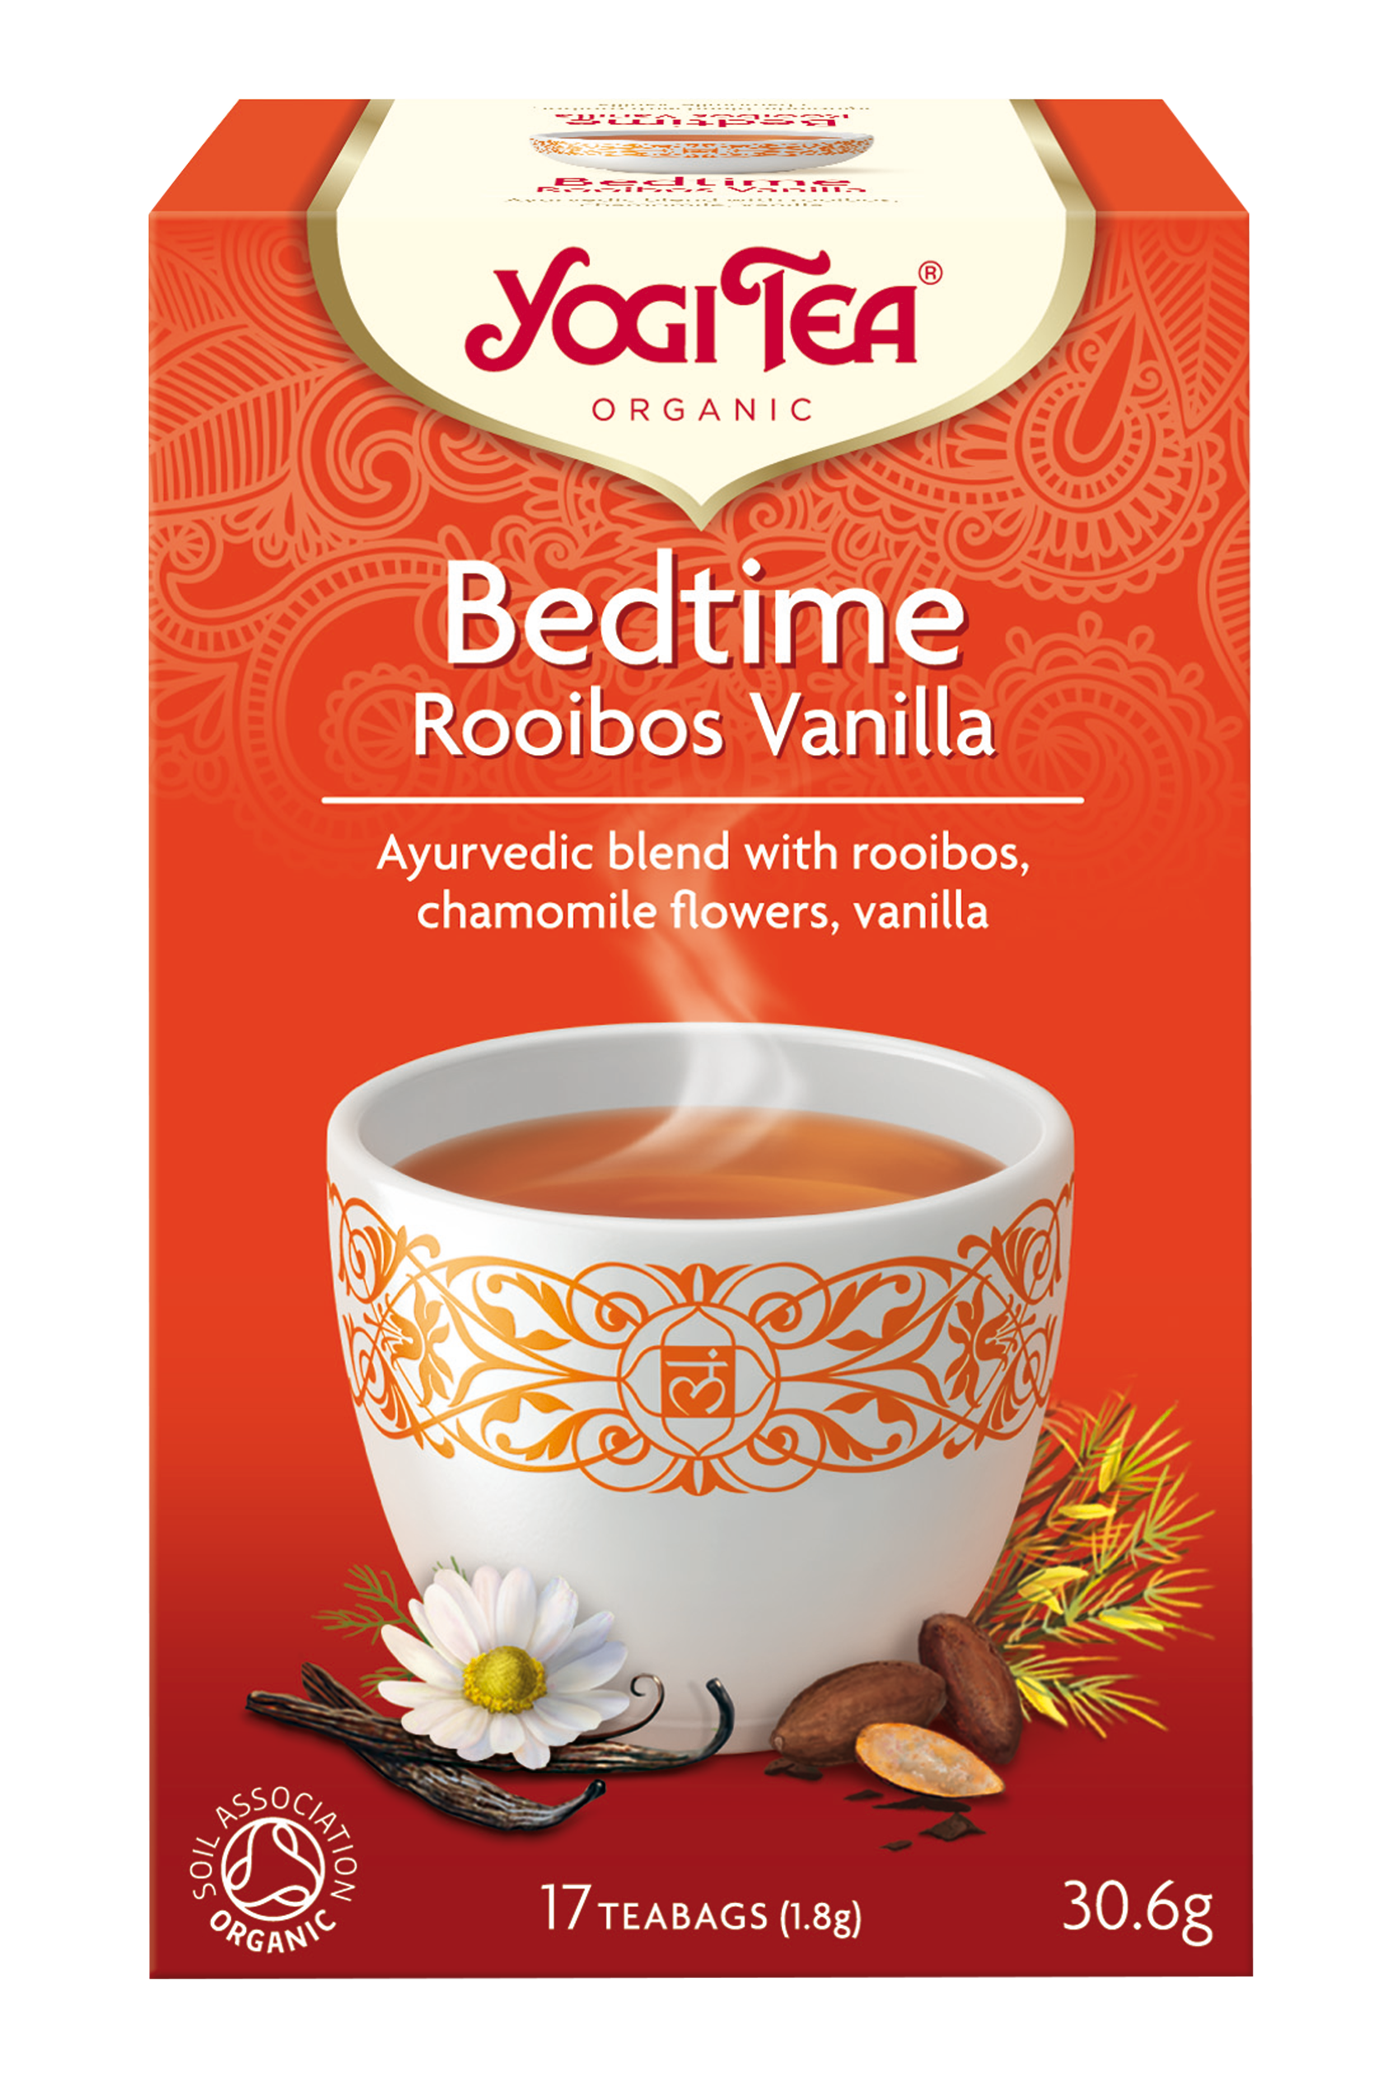 Yogi Tea Bedtime Rooibos Vanilla Te - 17 Brev